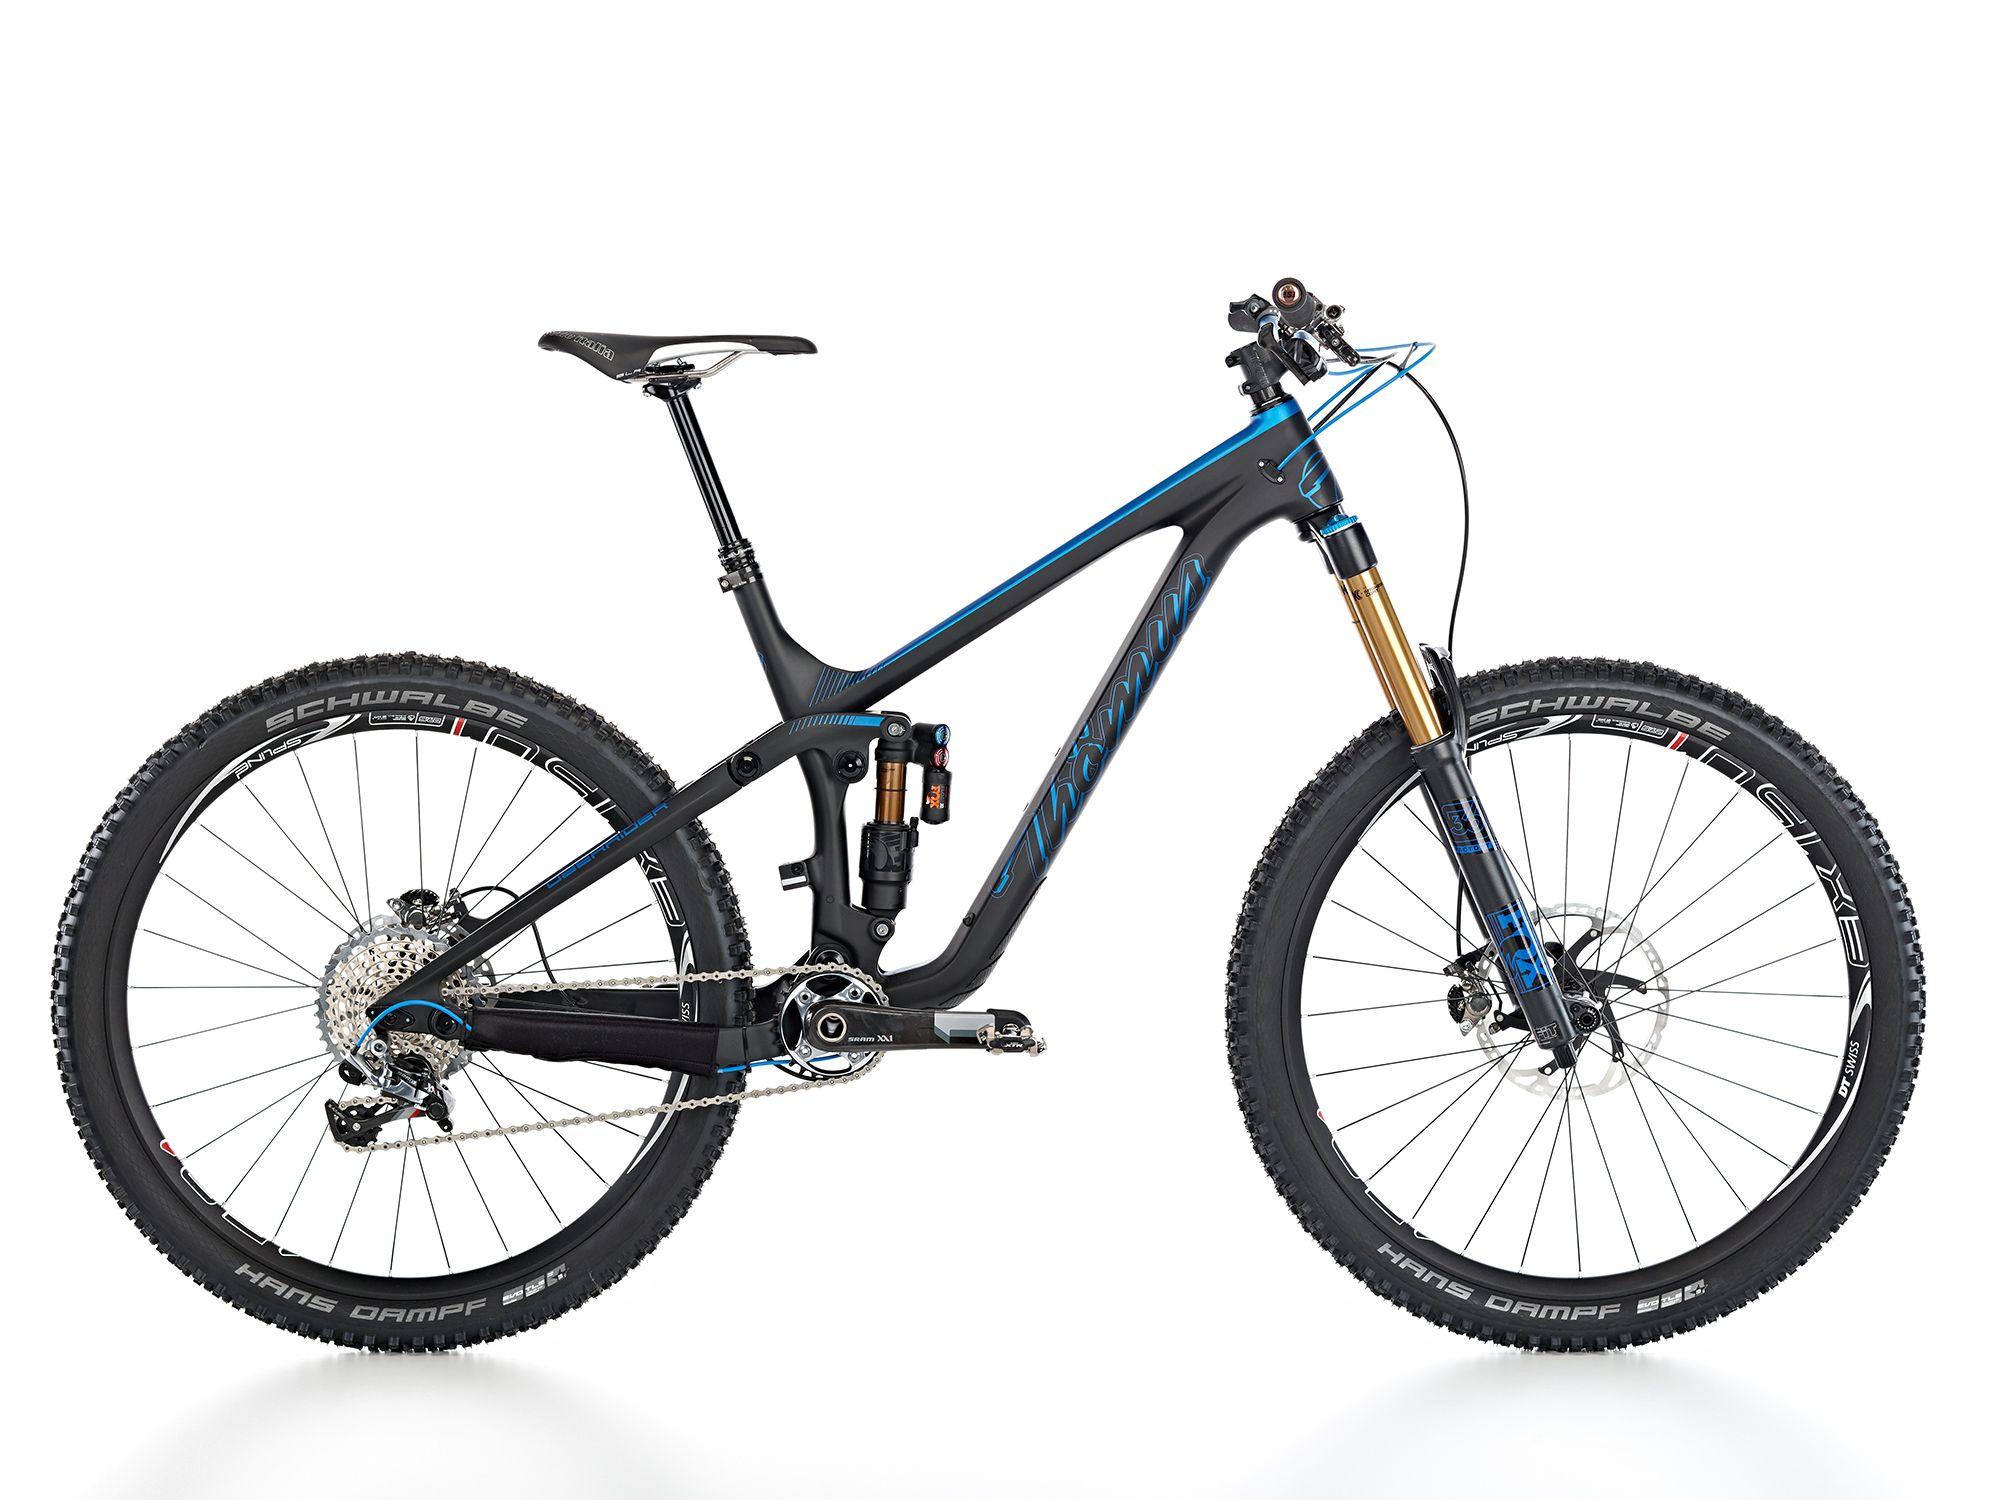 Thomus Oberrider Design Magnus Almgren Mangodesigns Bicycle